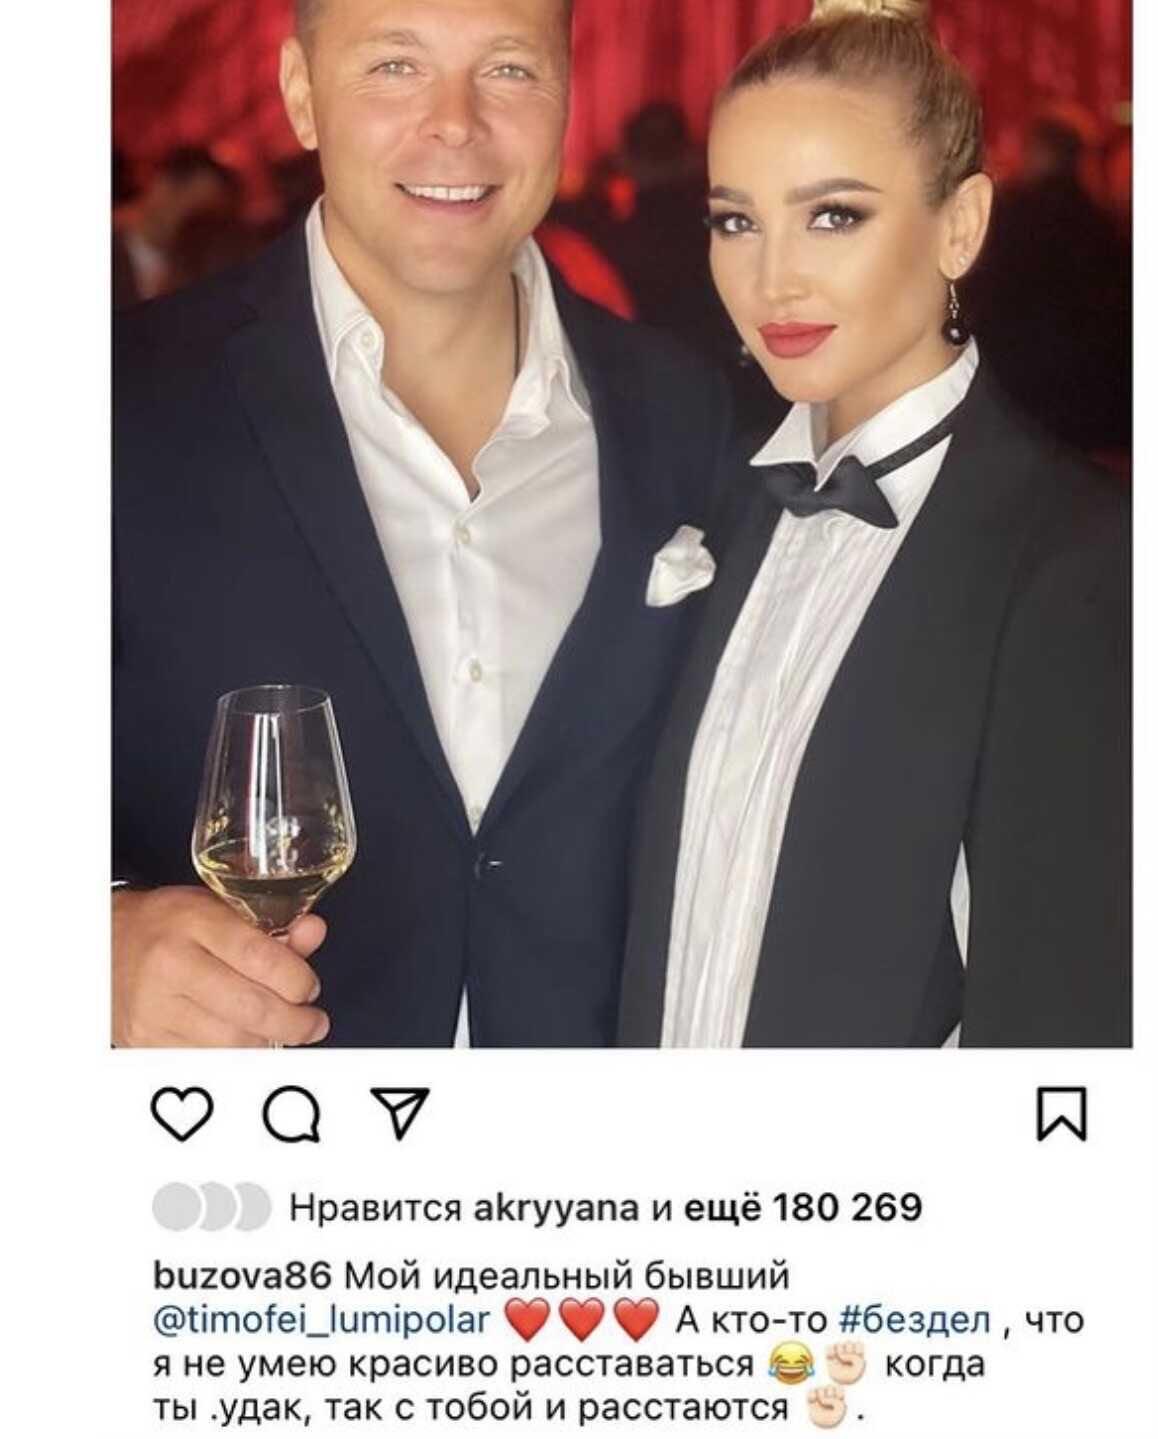 Olga Buzova spent an evening with her ex-lover, David Manukyan's injections